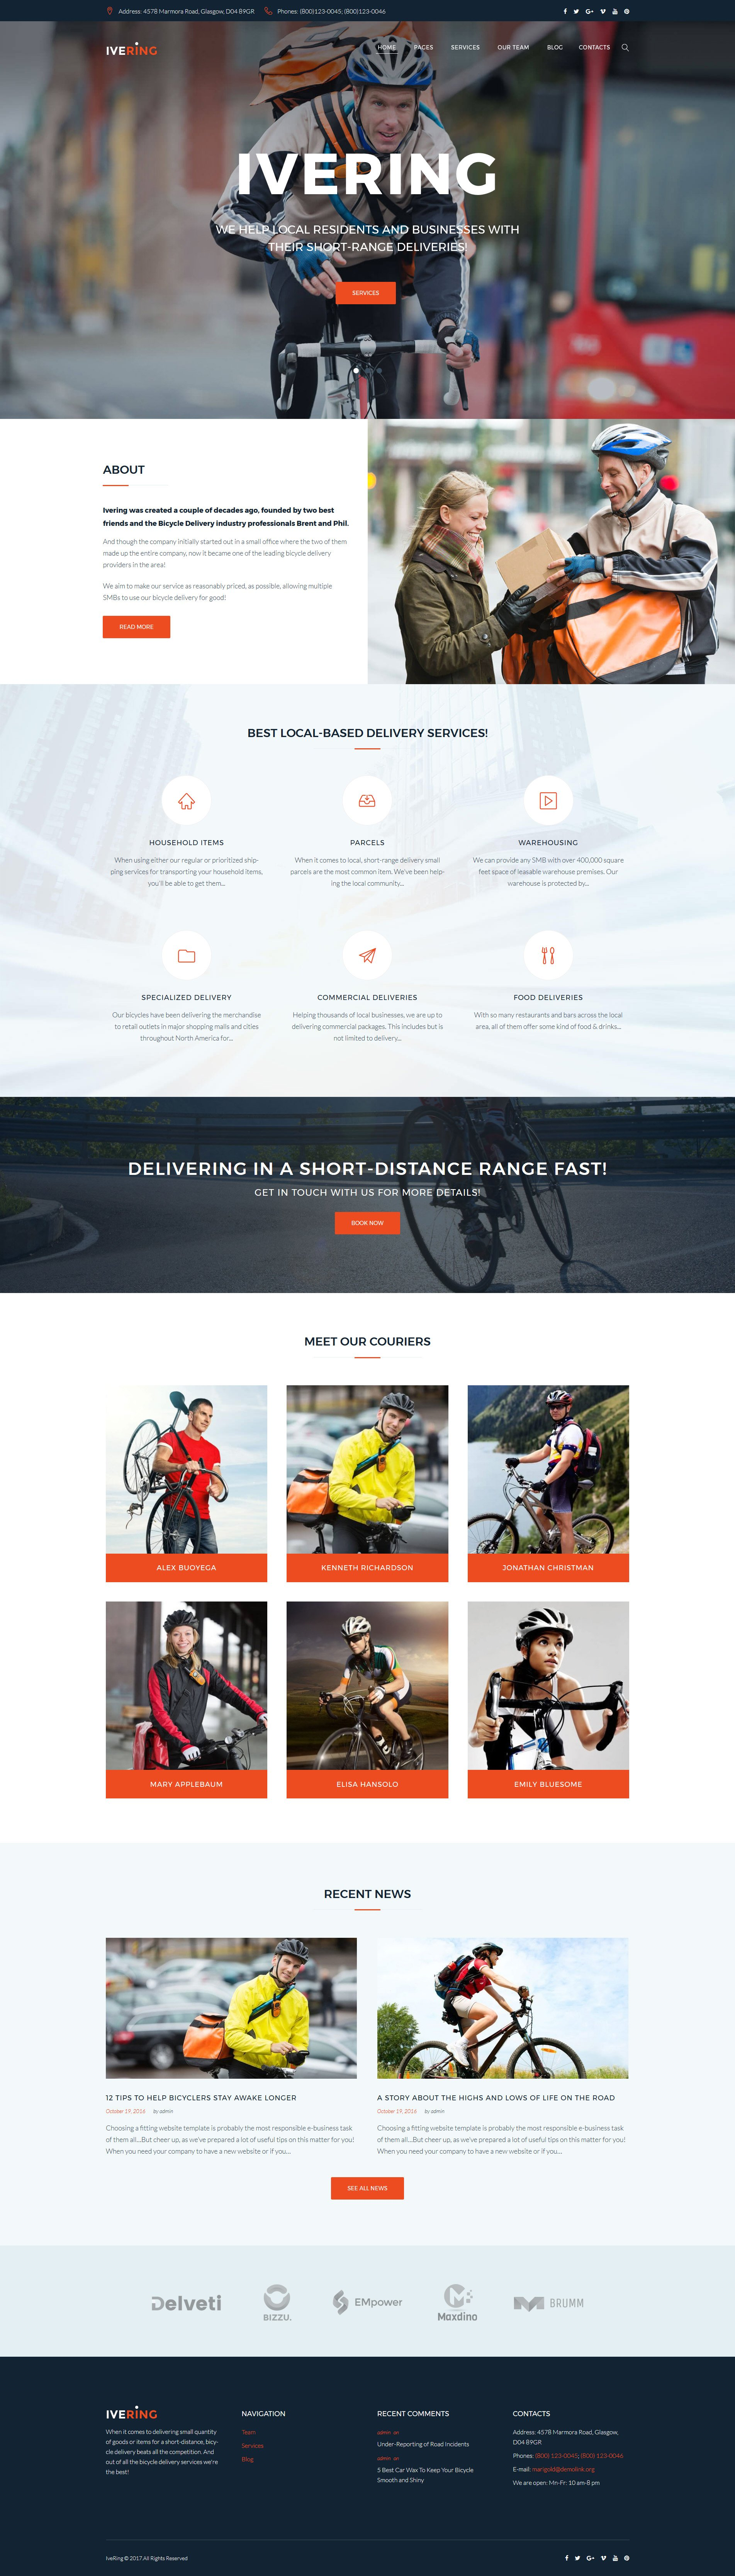 Адаптивный шаблон сайта на тему услуги доставки #63526